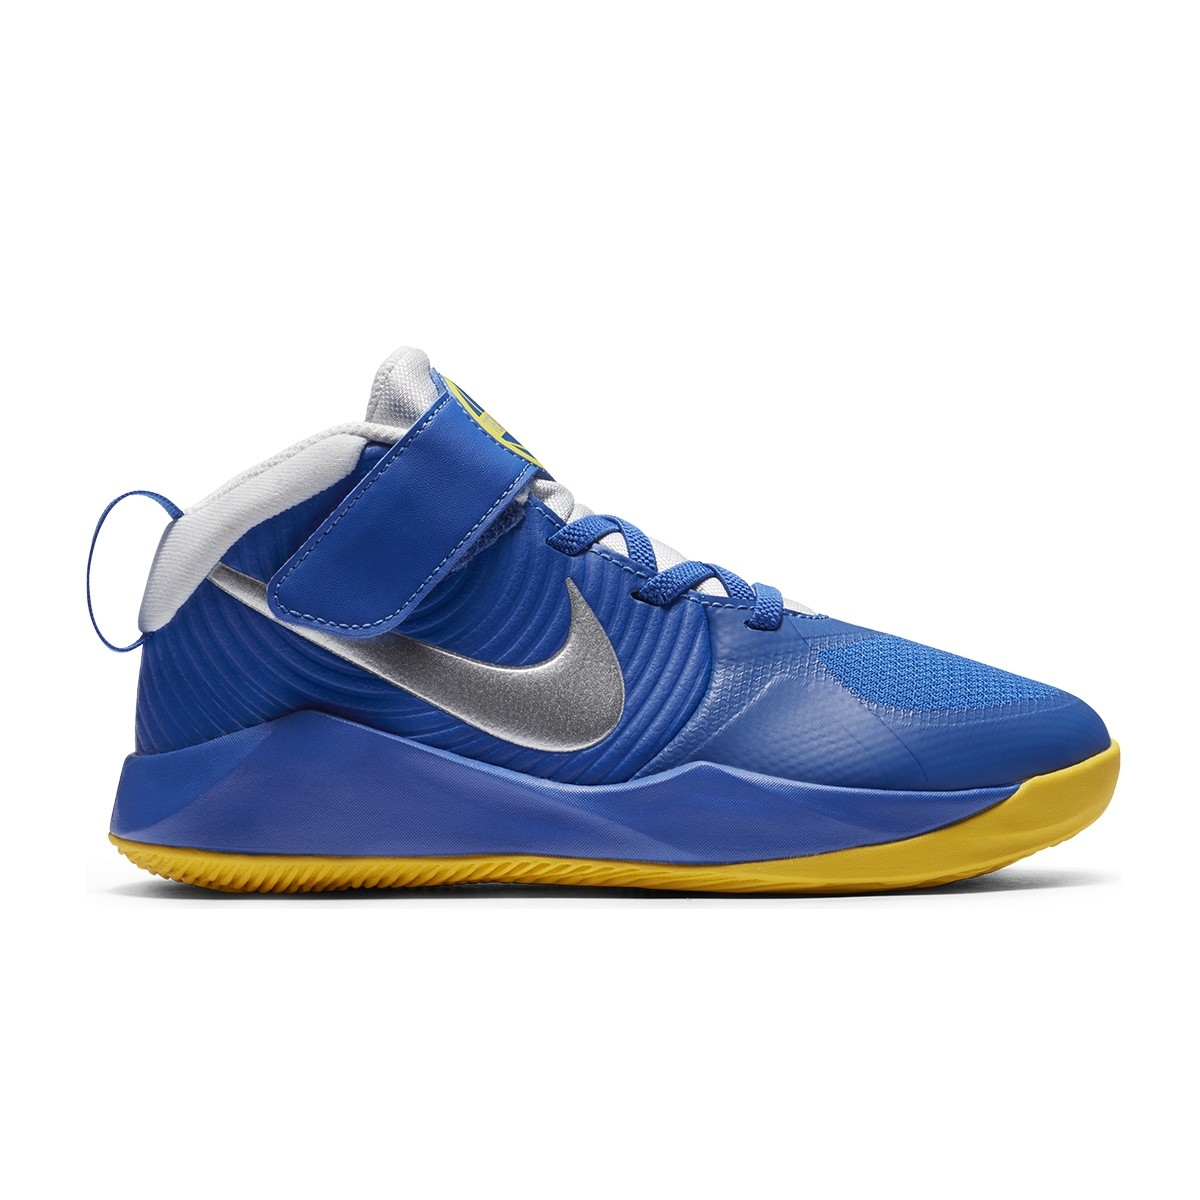 Nike Team Hustle D9 PS 'GSW'